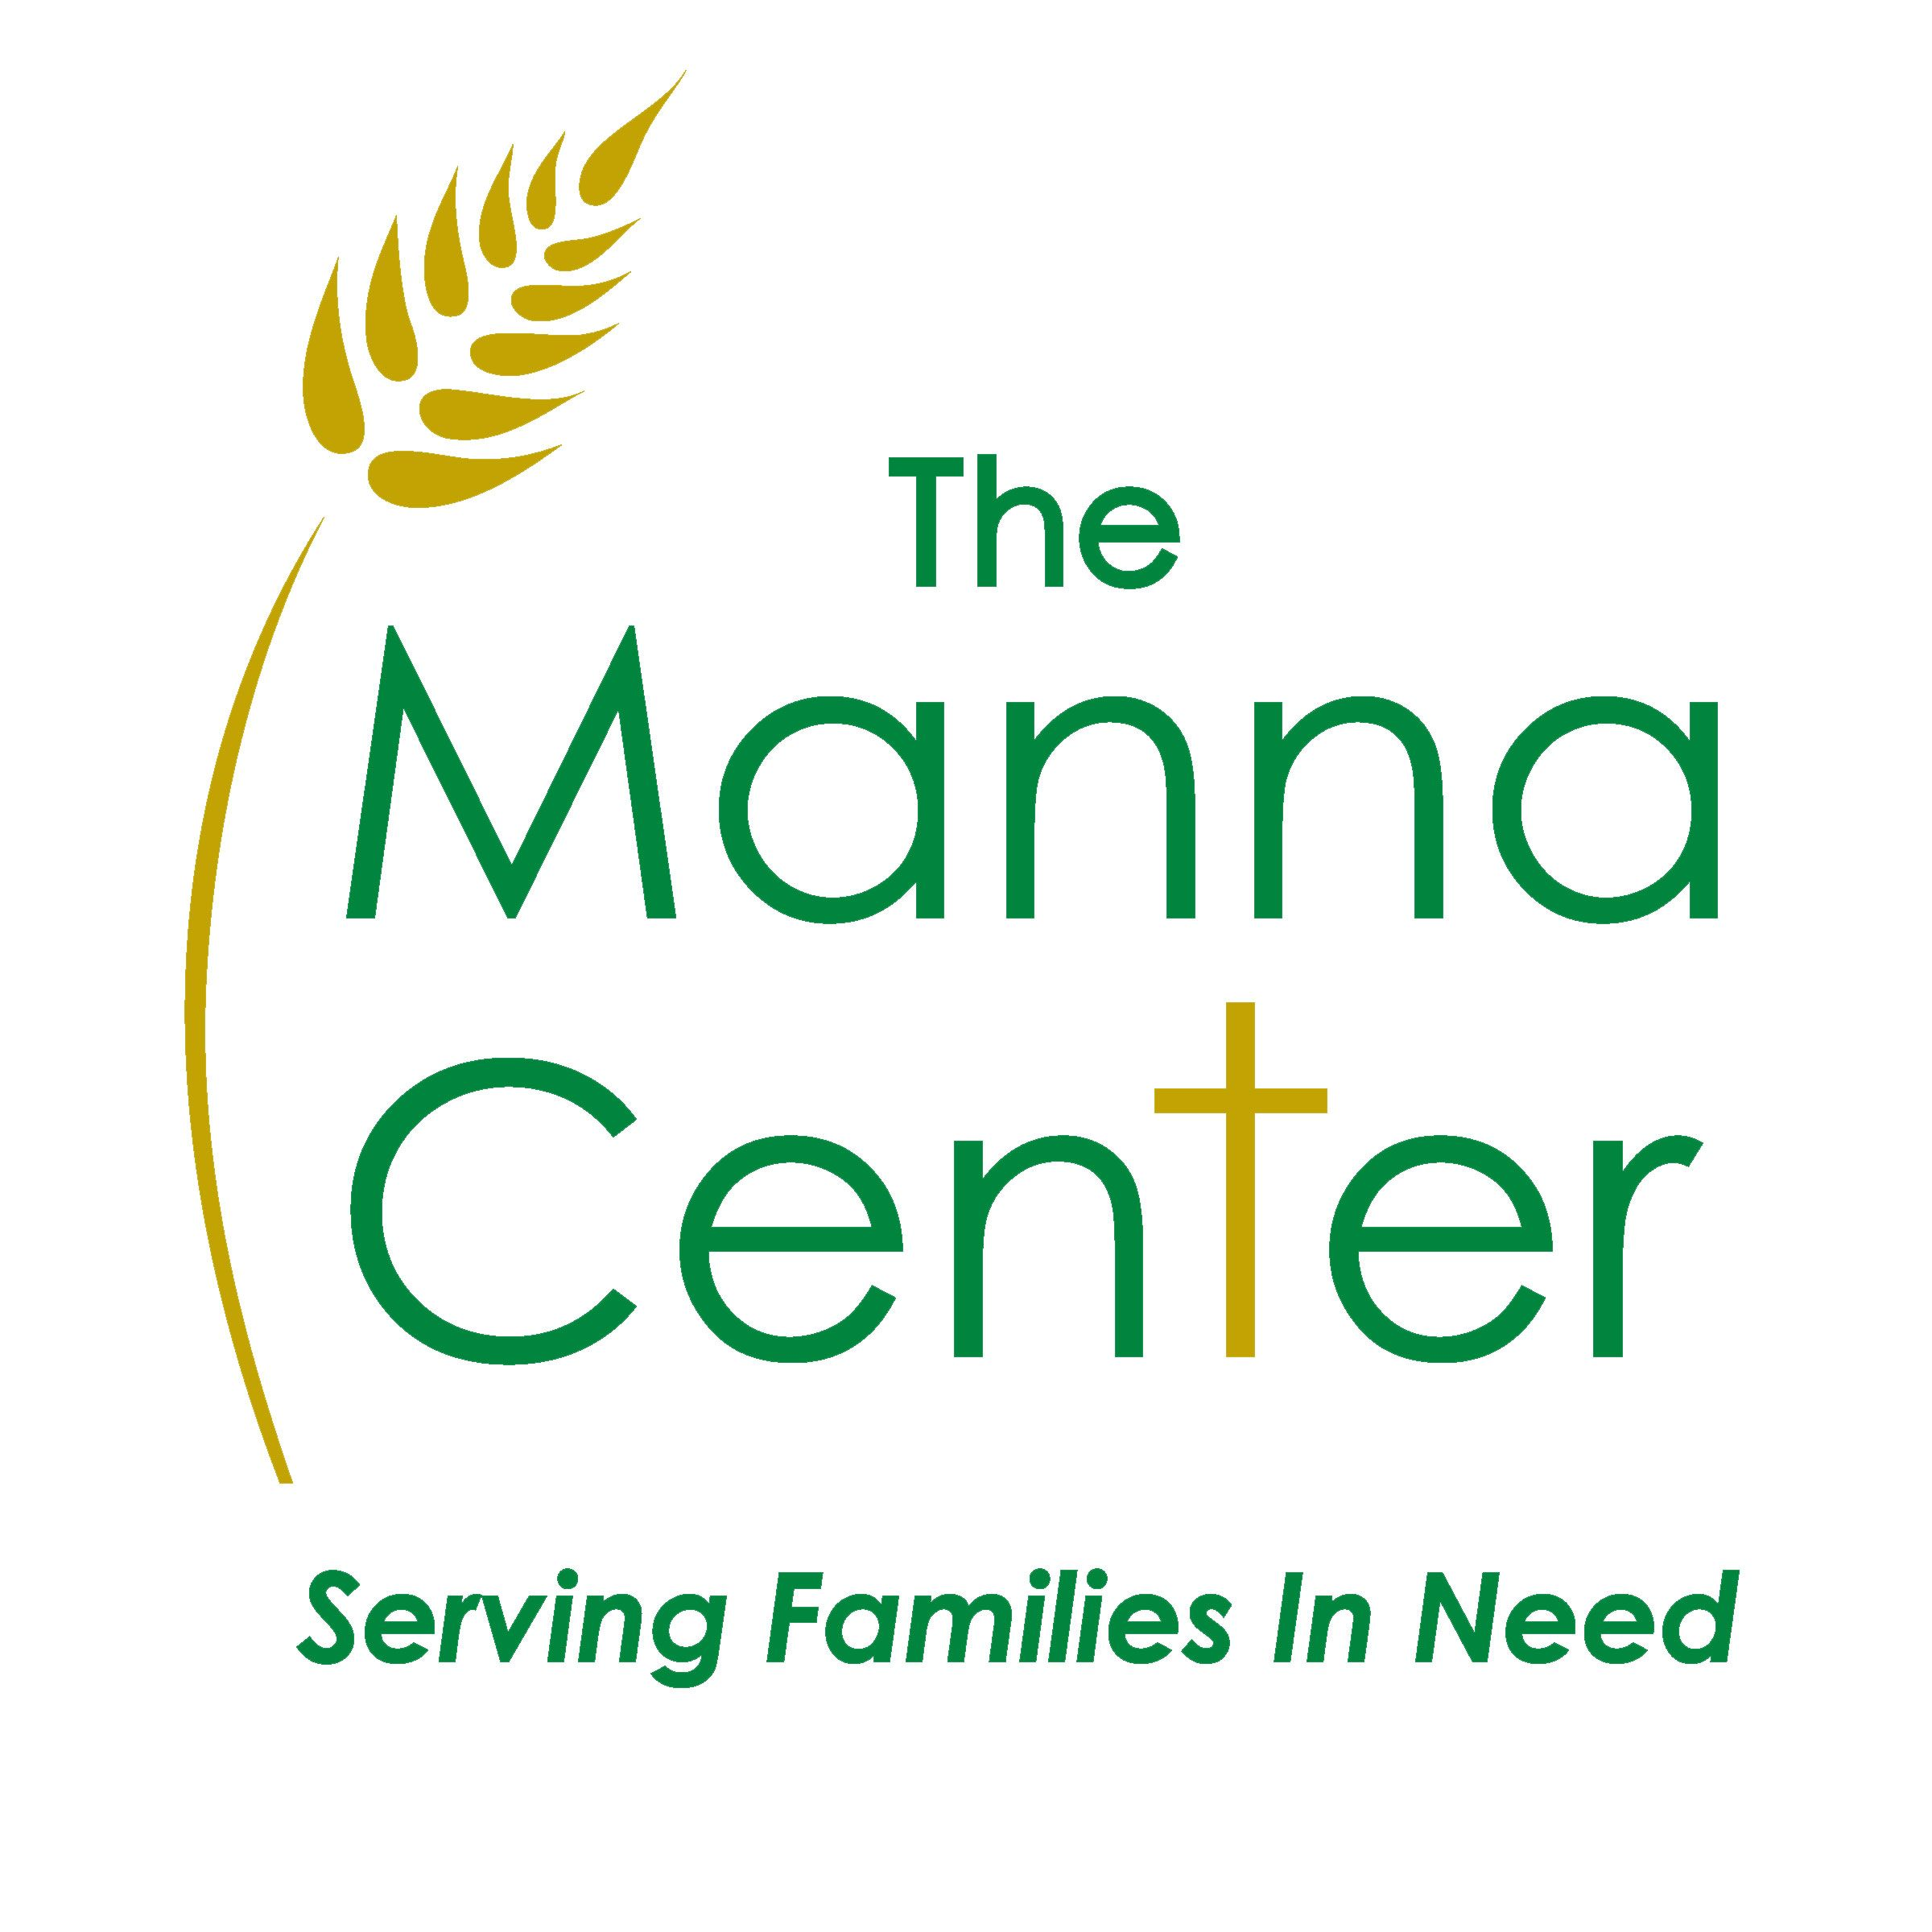 Manna Center Inc